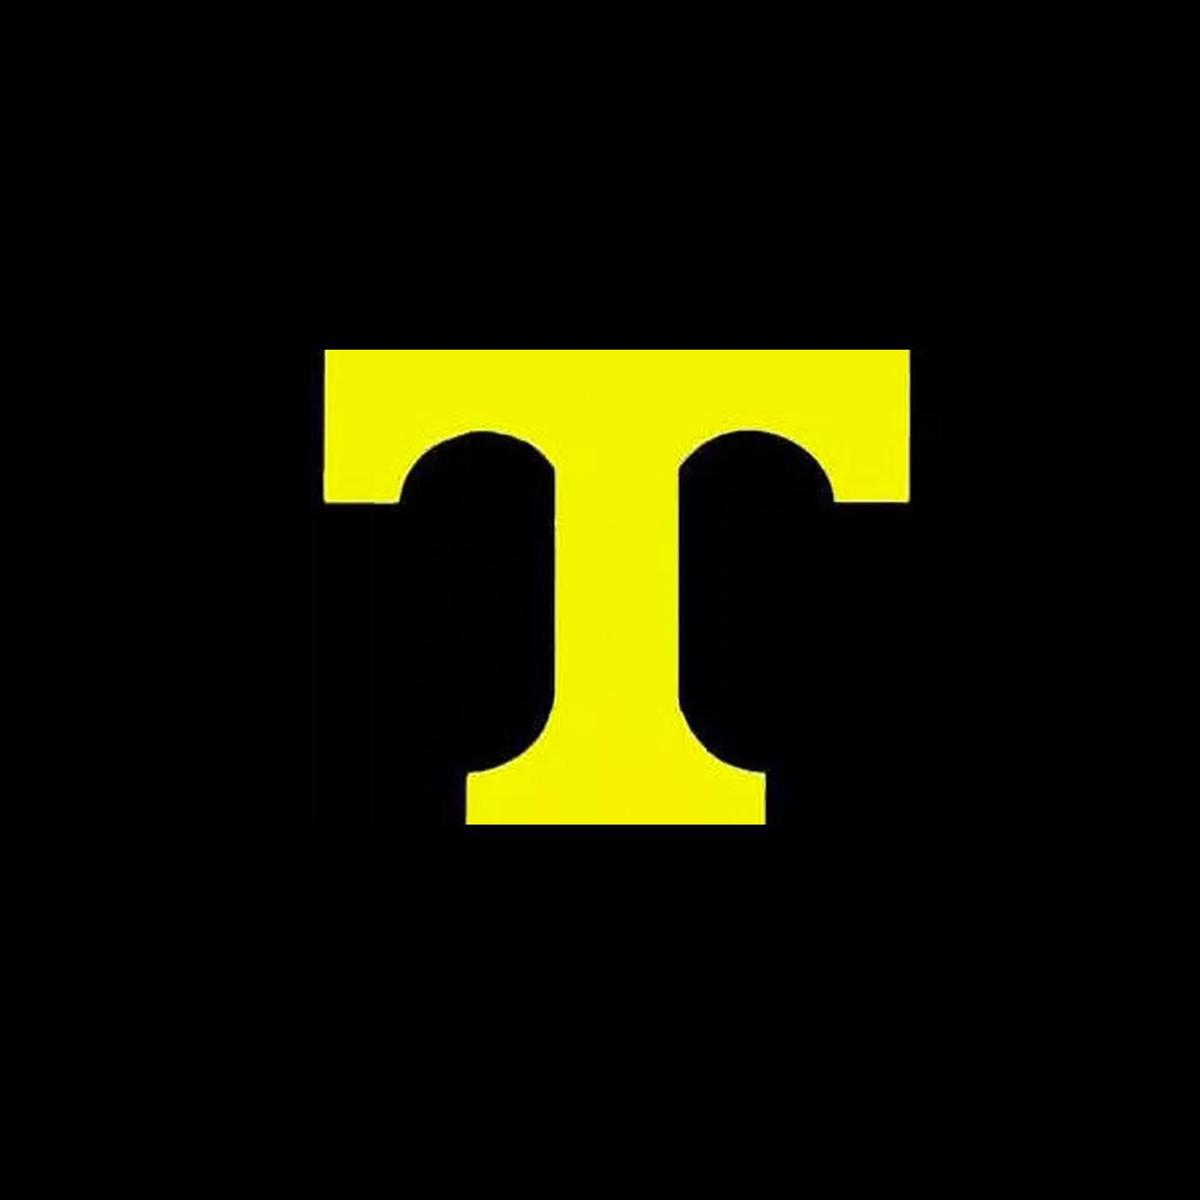 Tuscola logo